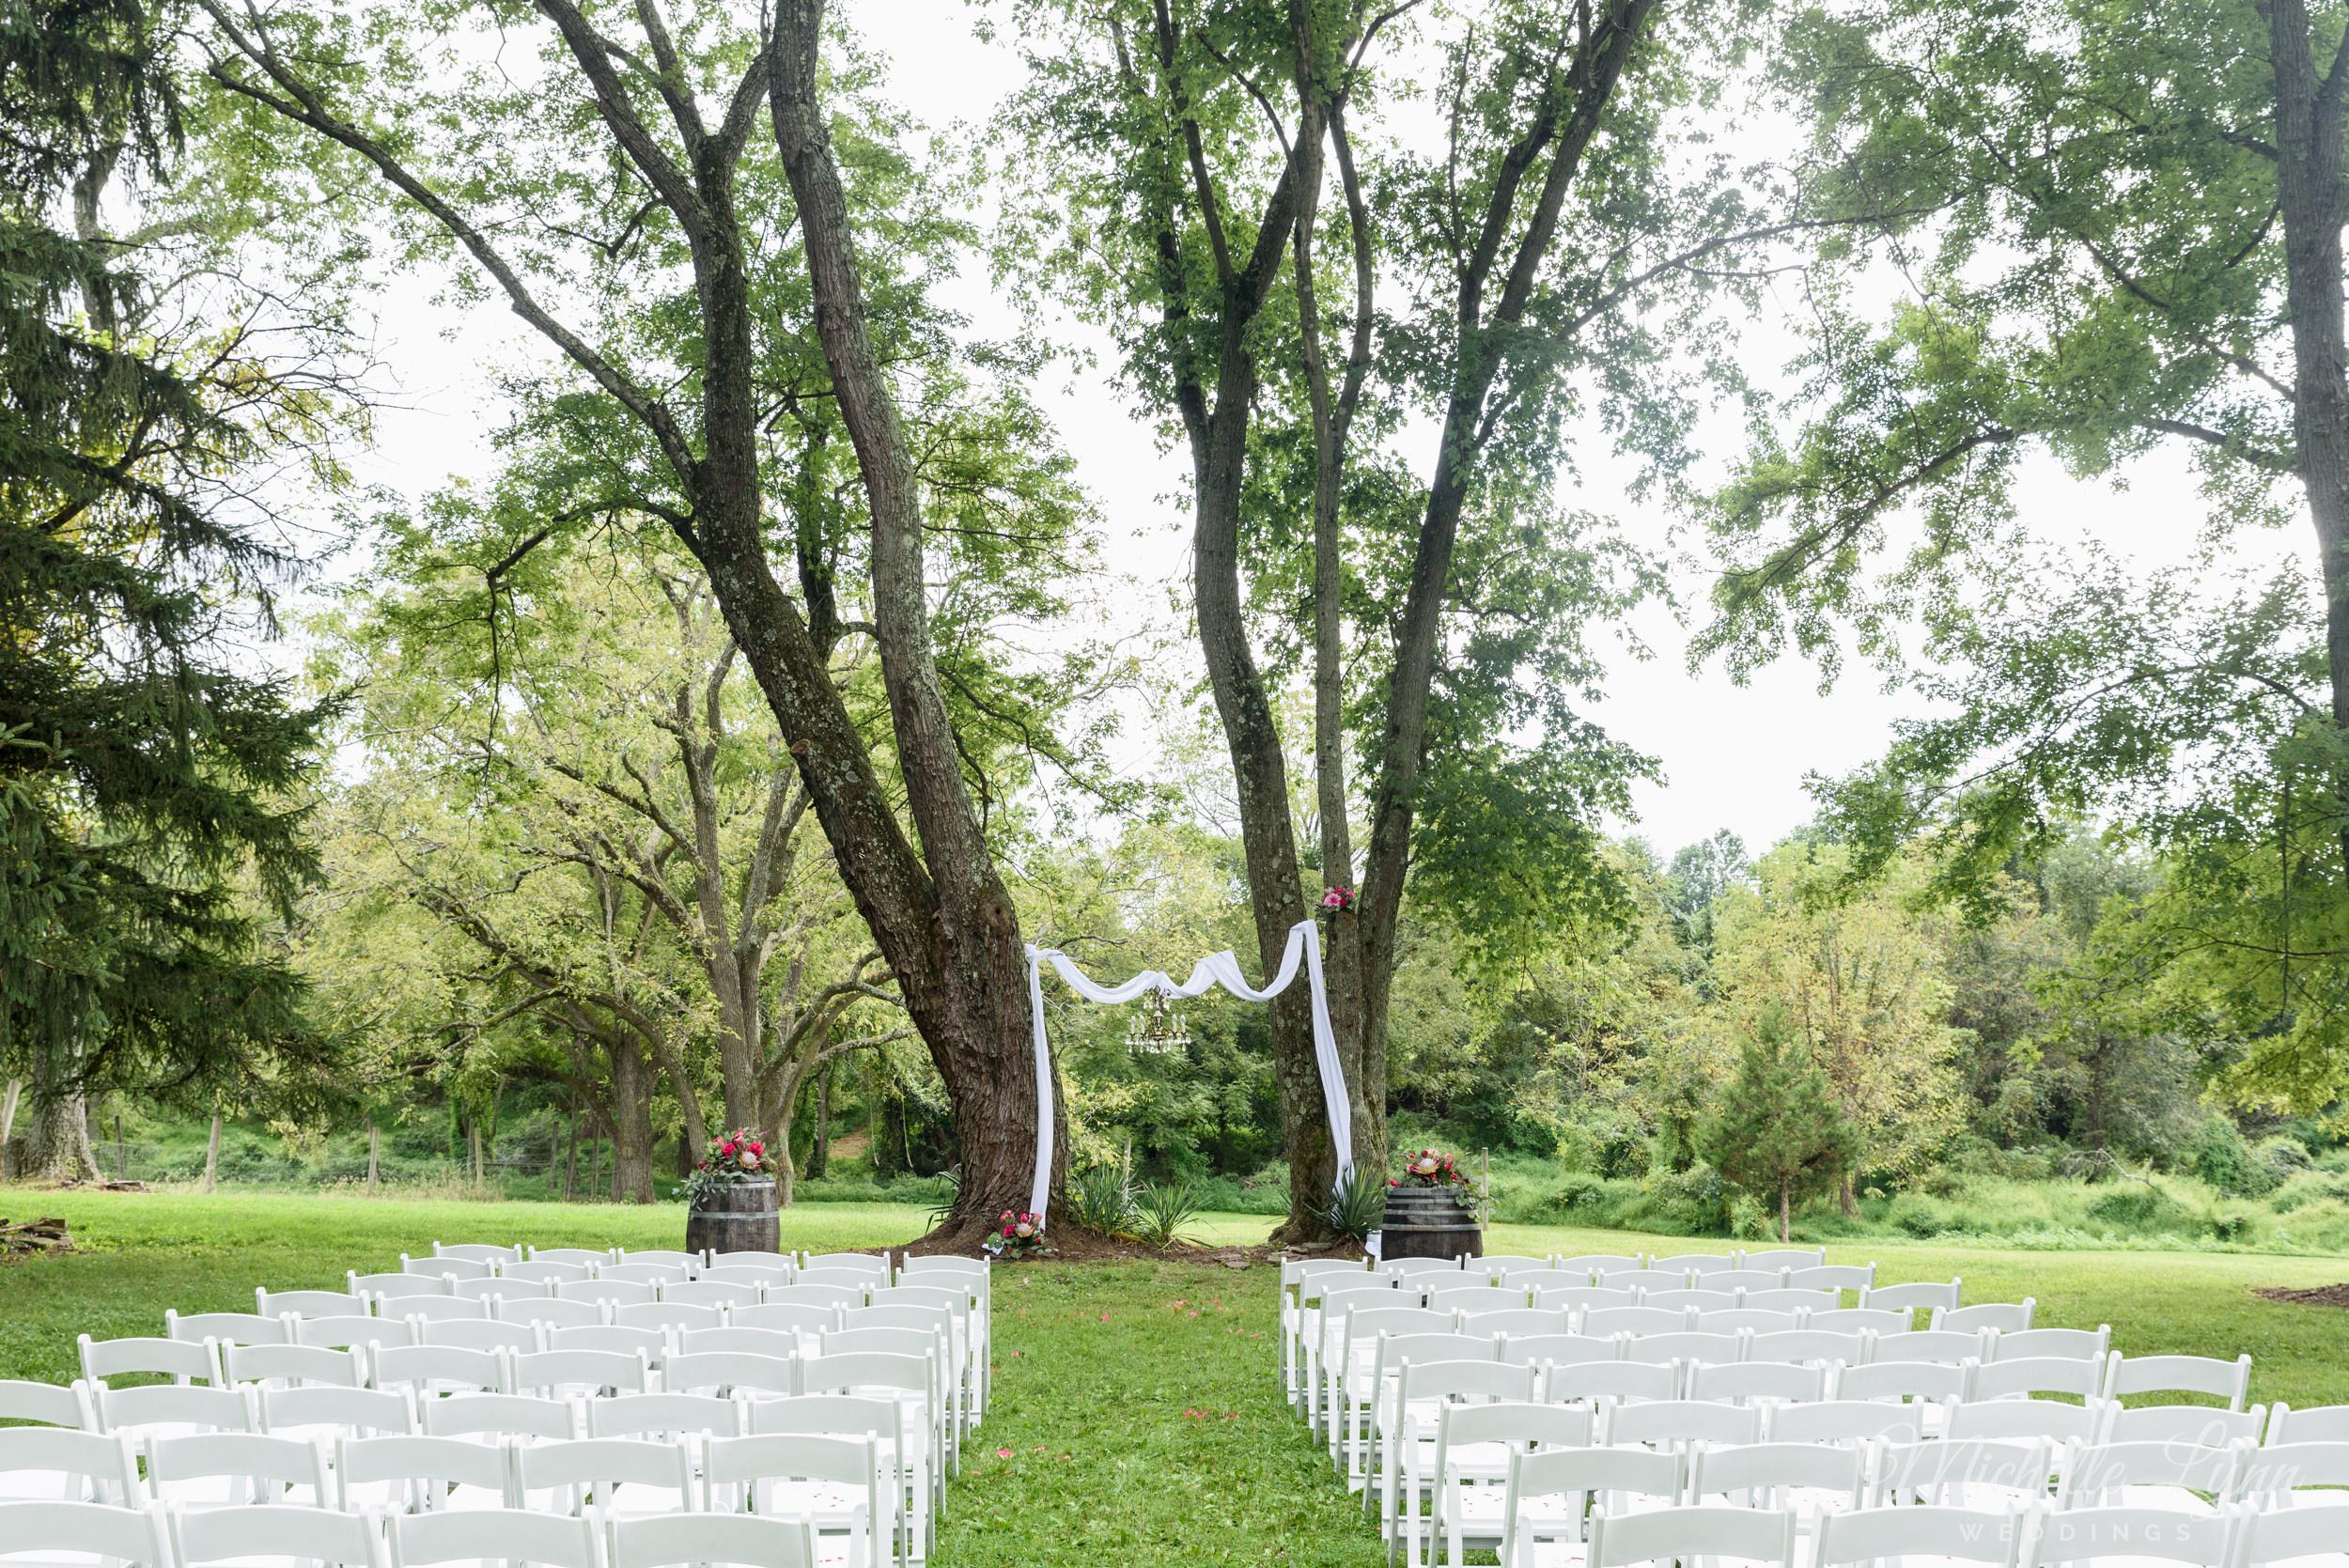 mlw-unionville-vineyards-nj-wedding-photography-30.jpg